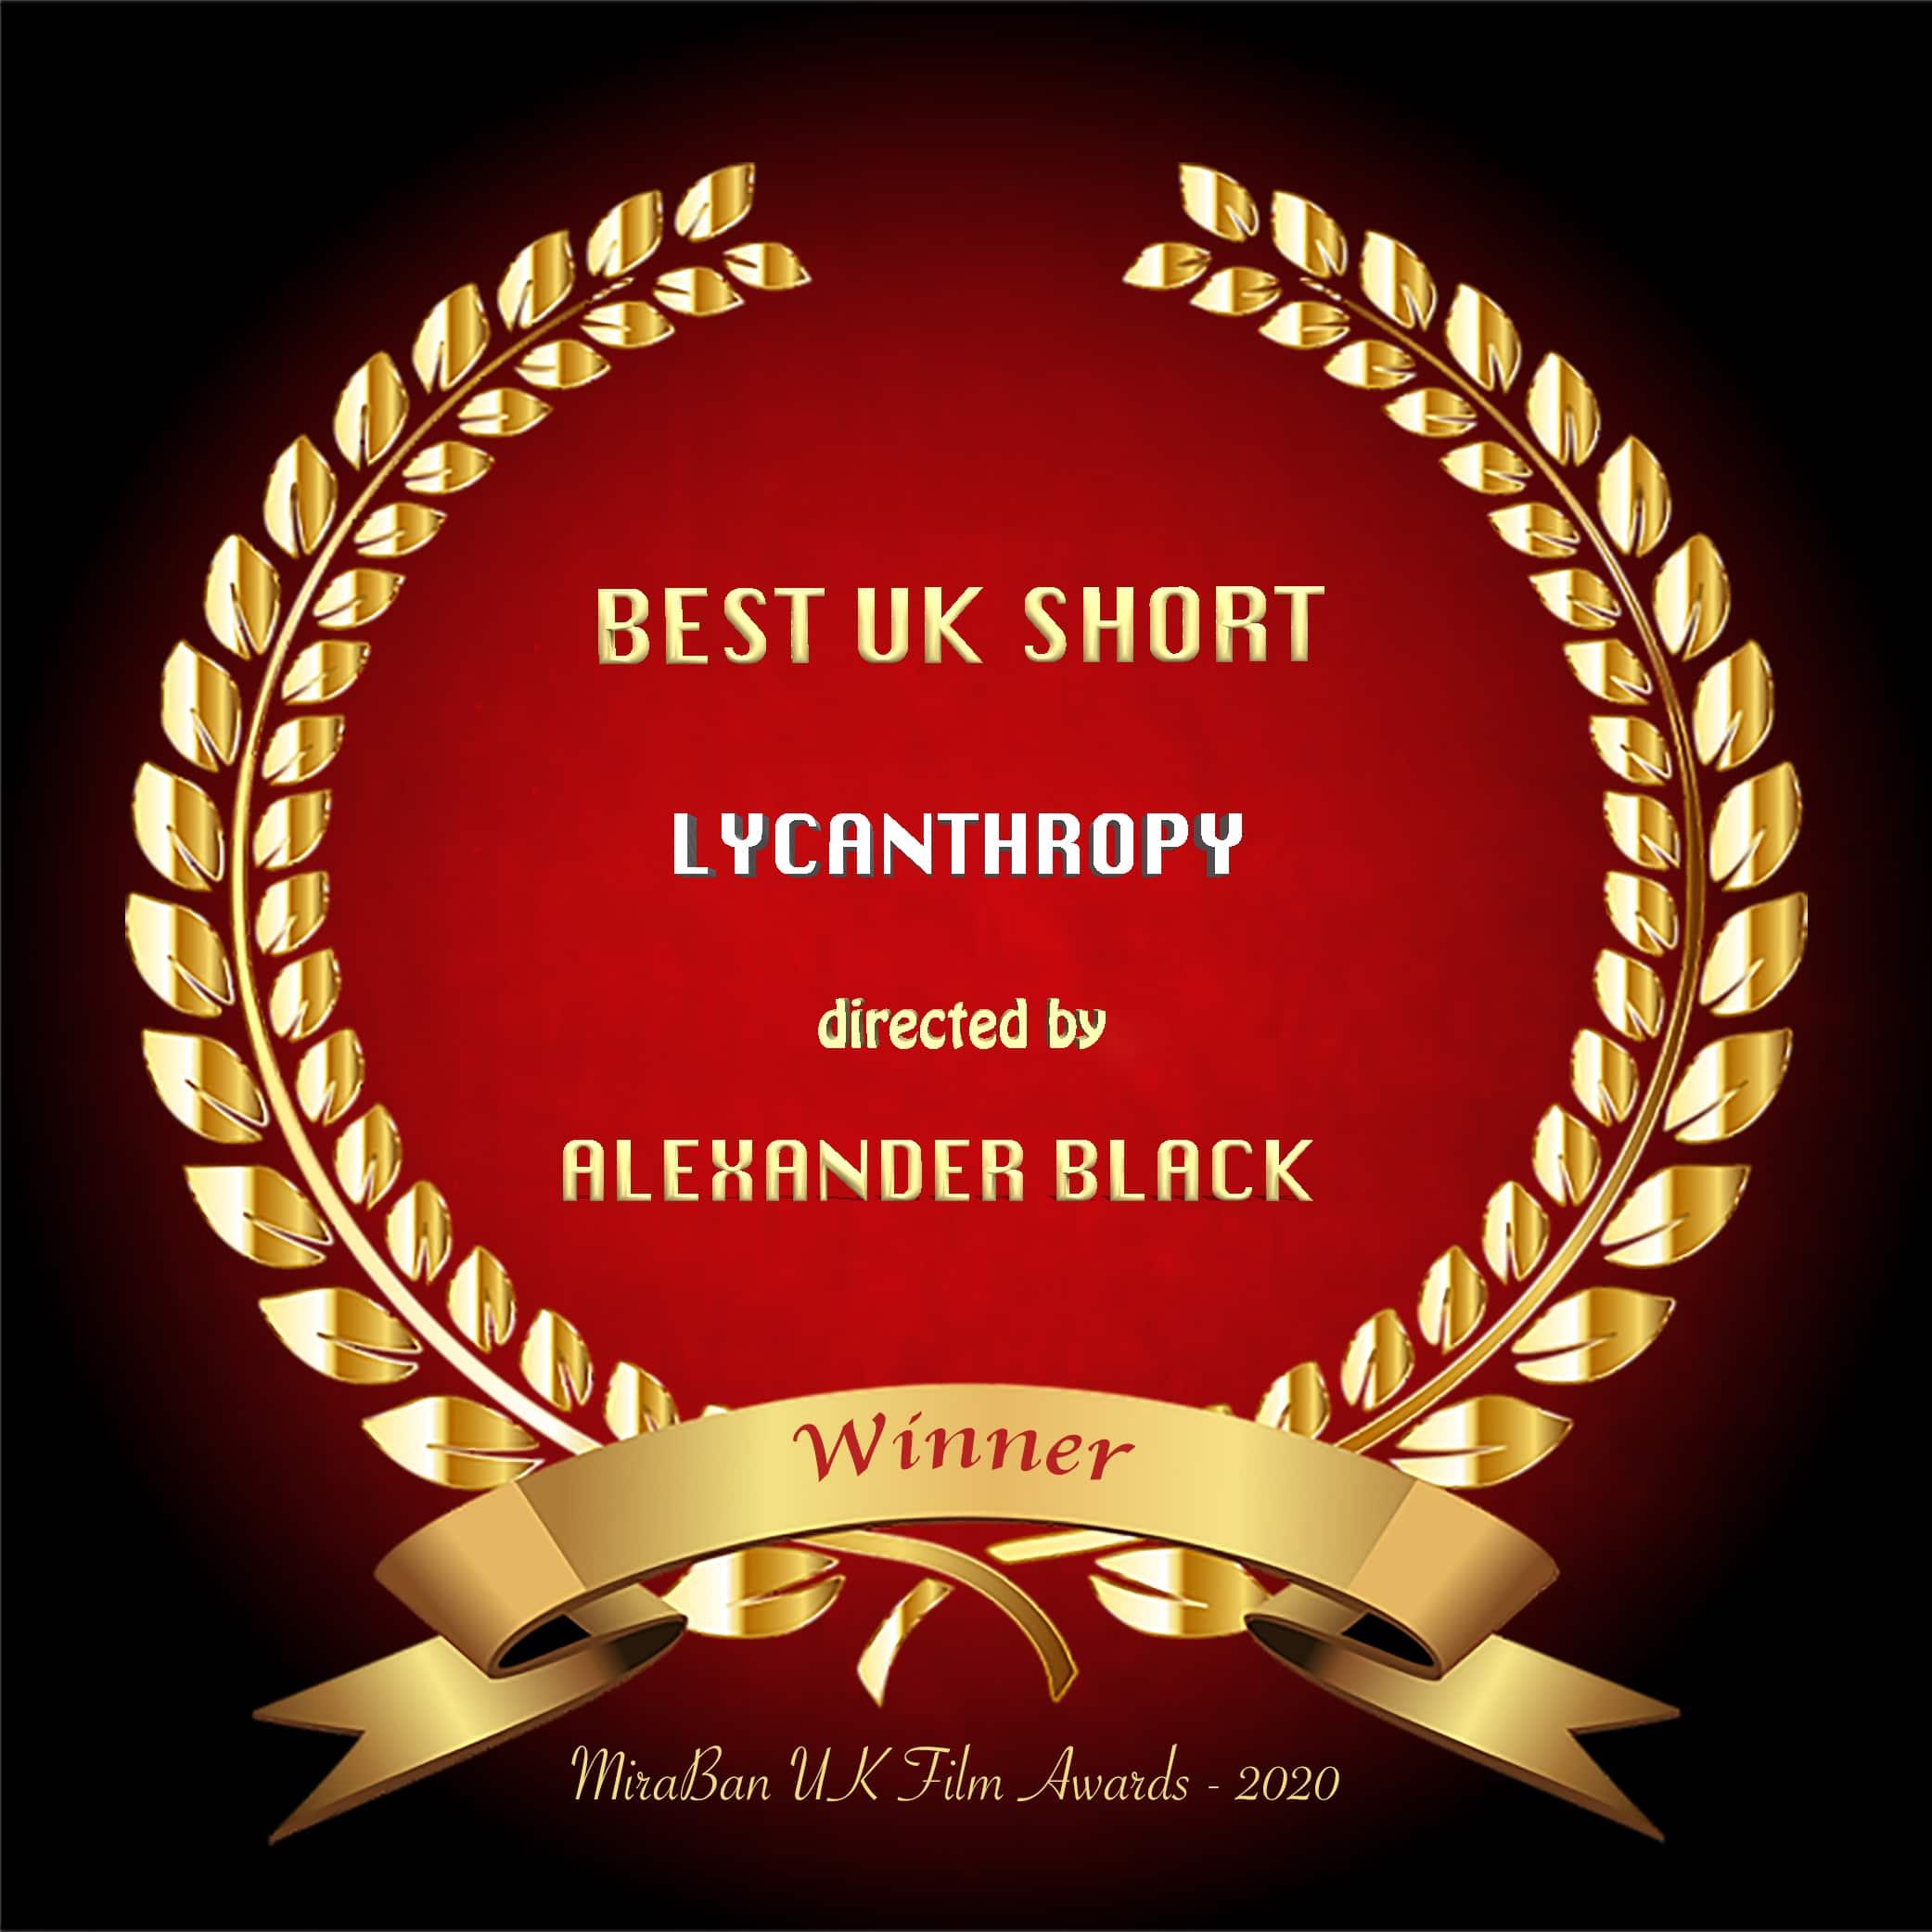 Best UK Short